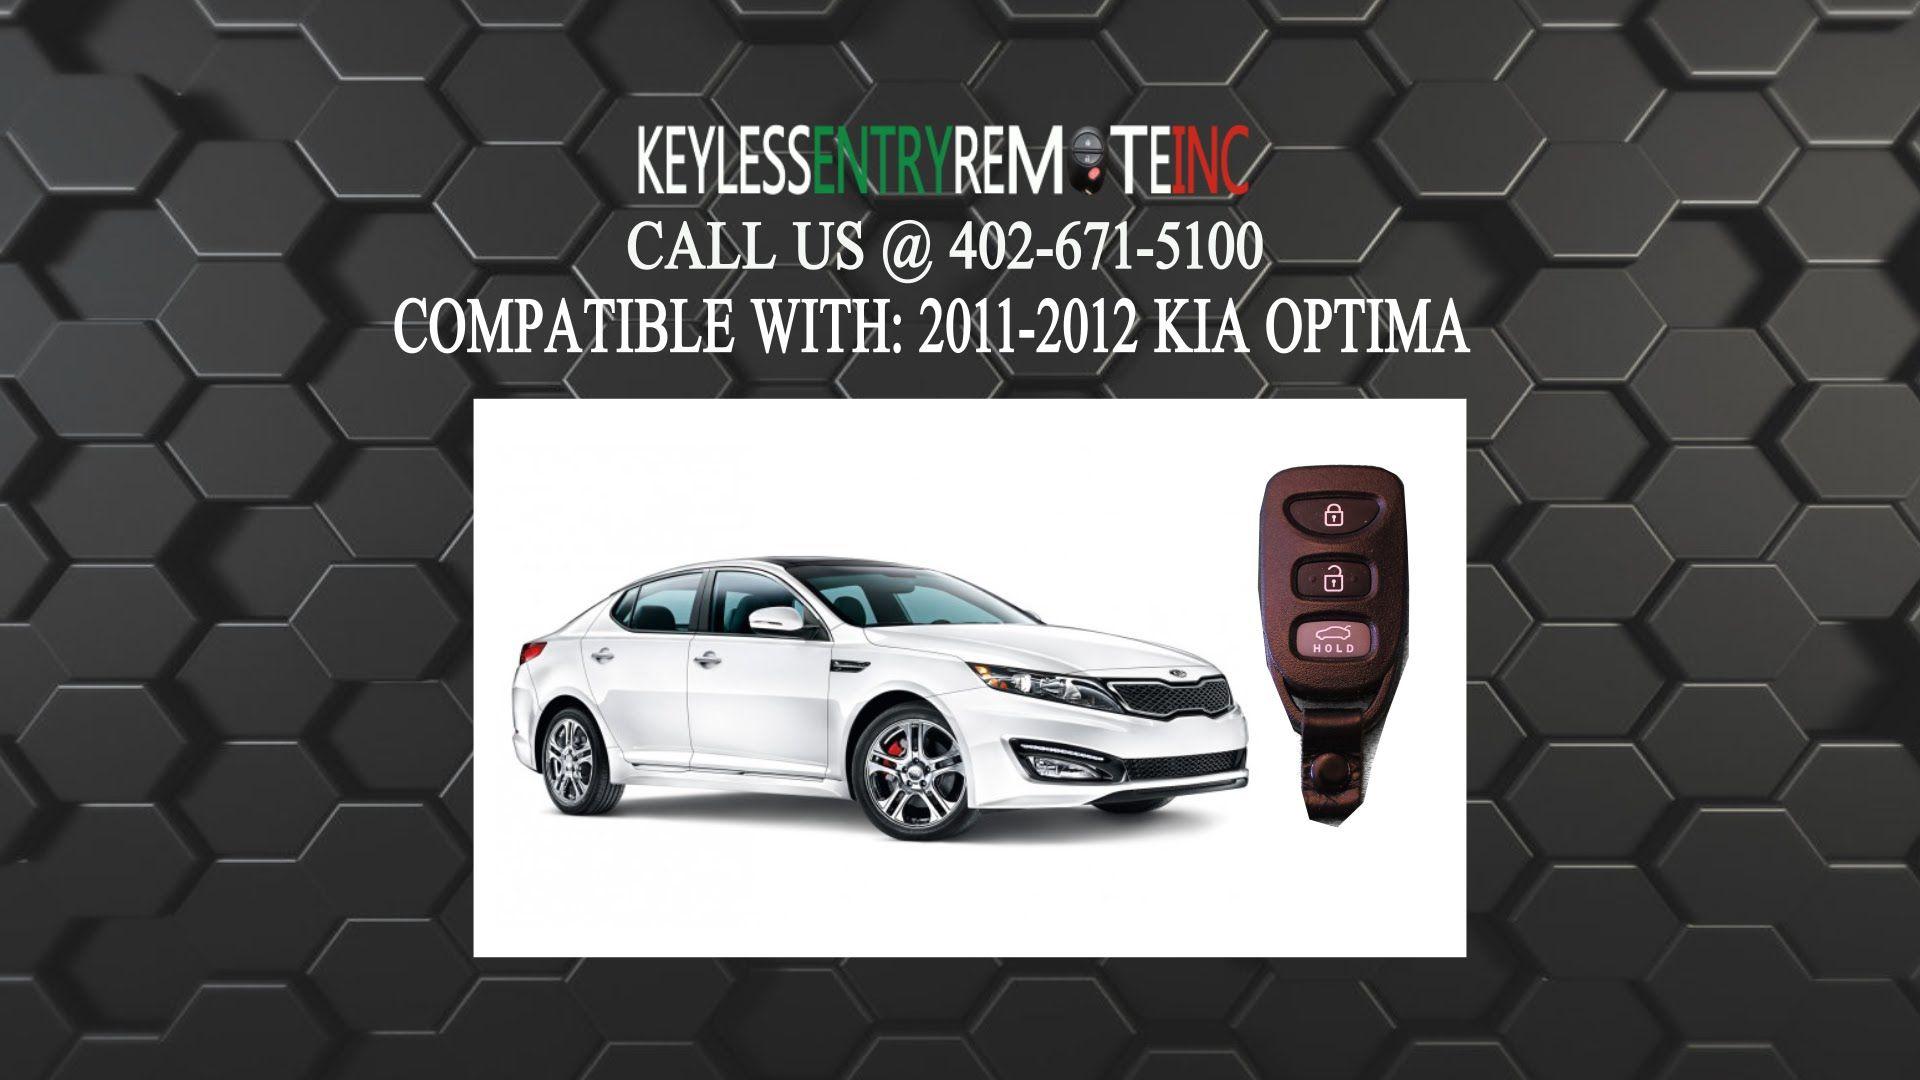 How To Replace A Kia Optima Key Fob Battery 2010 2013